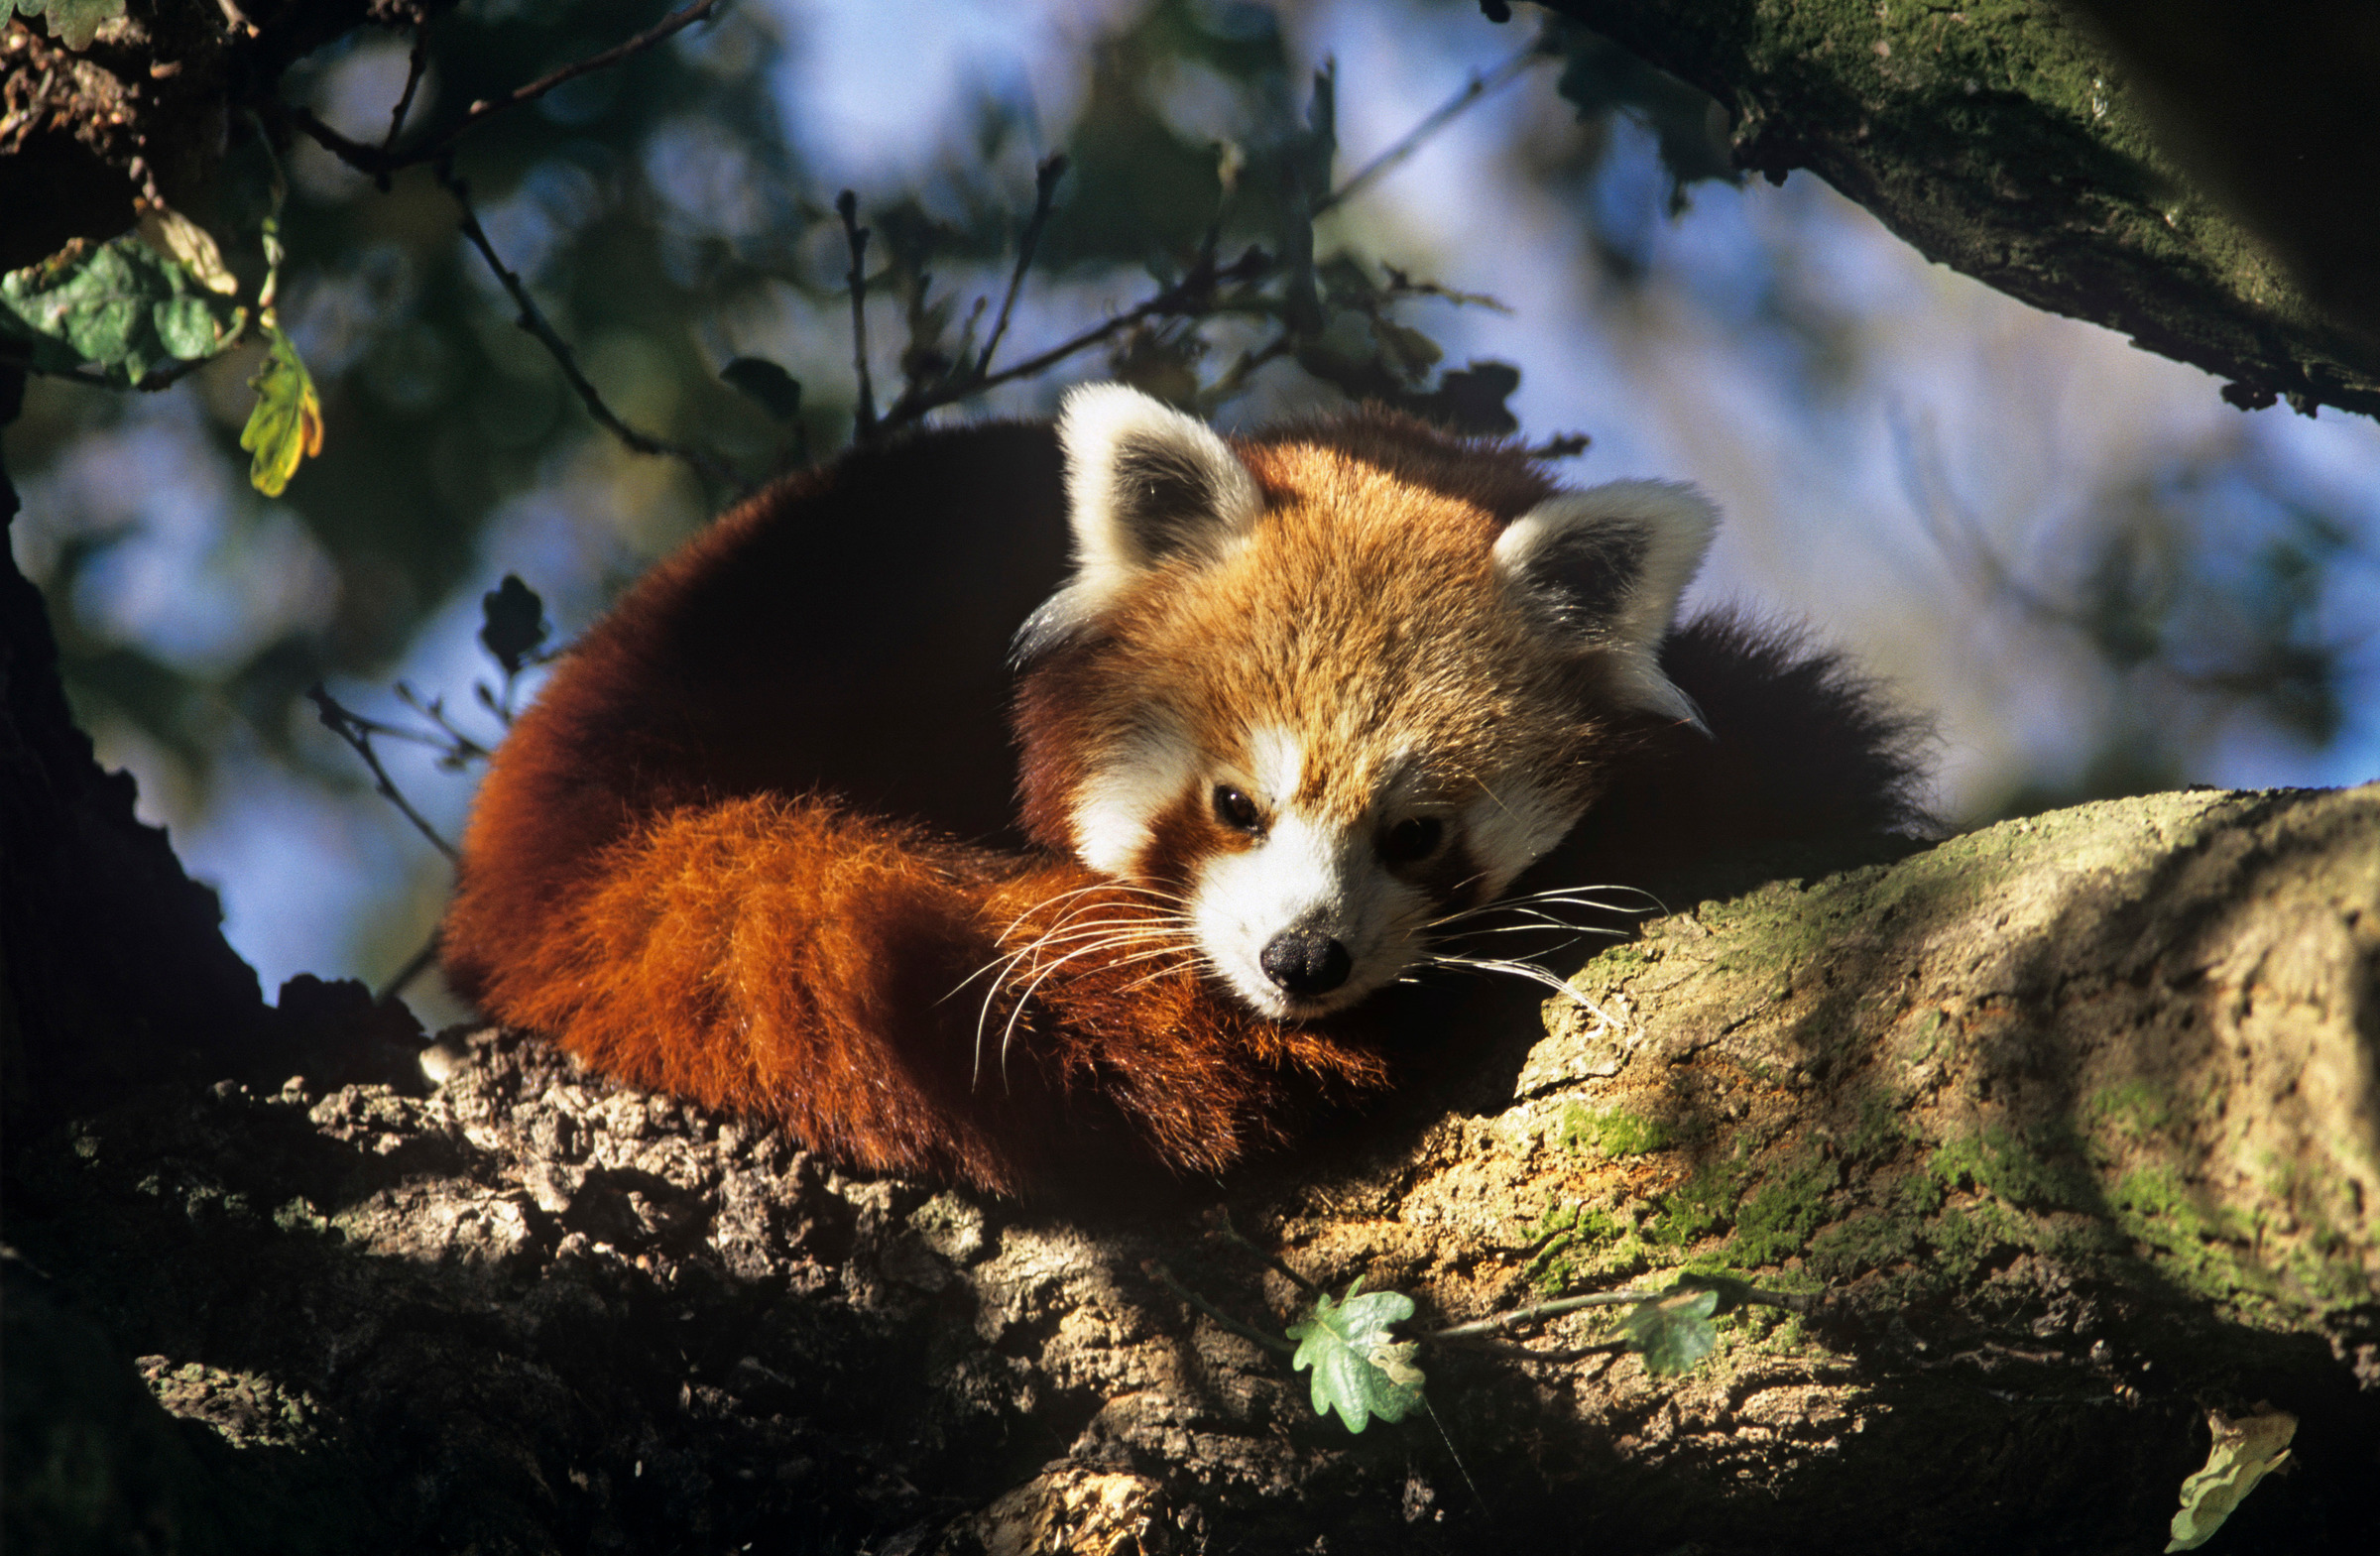 Roter Panda auf Ast